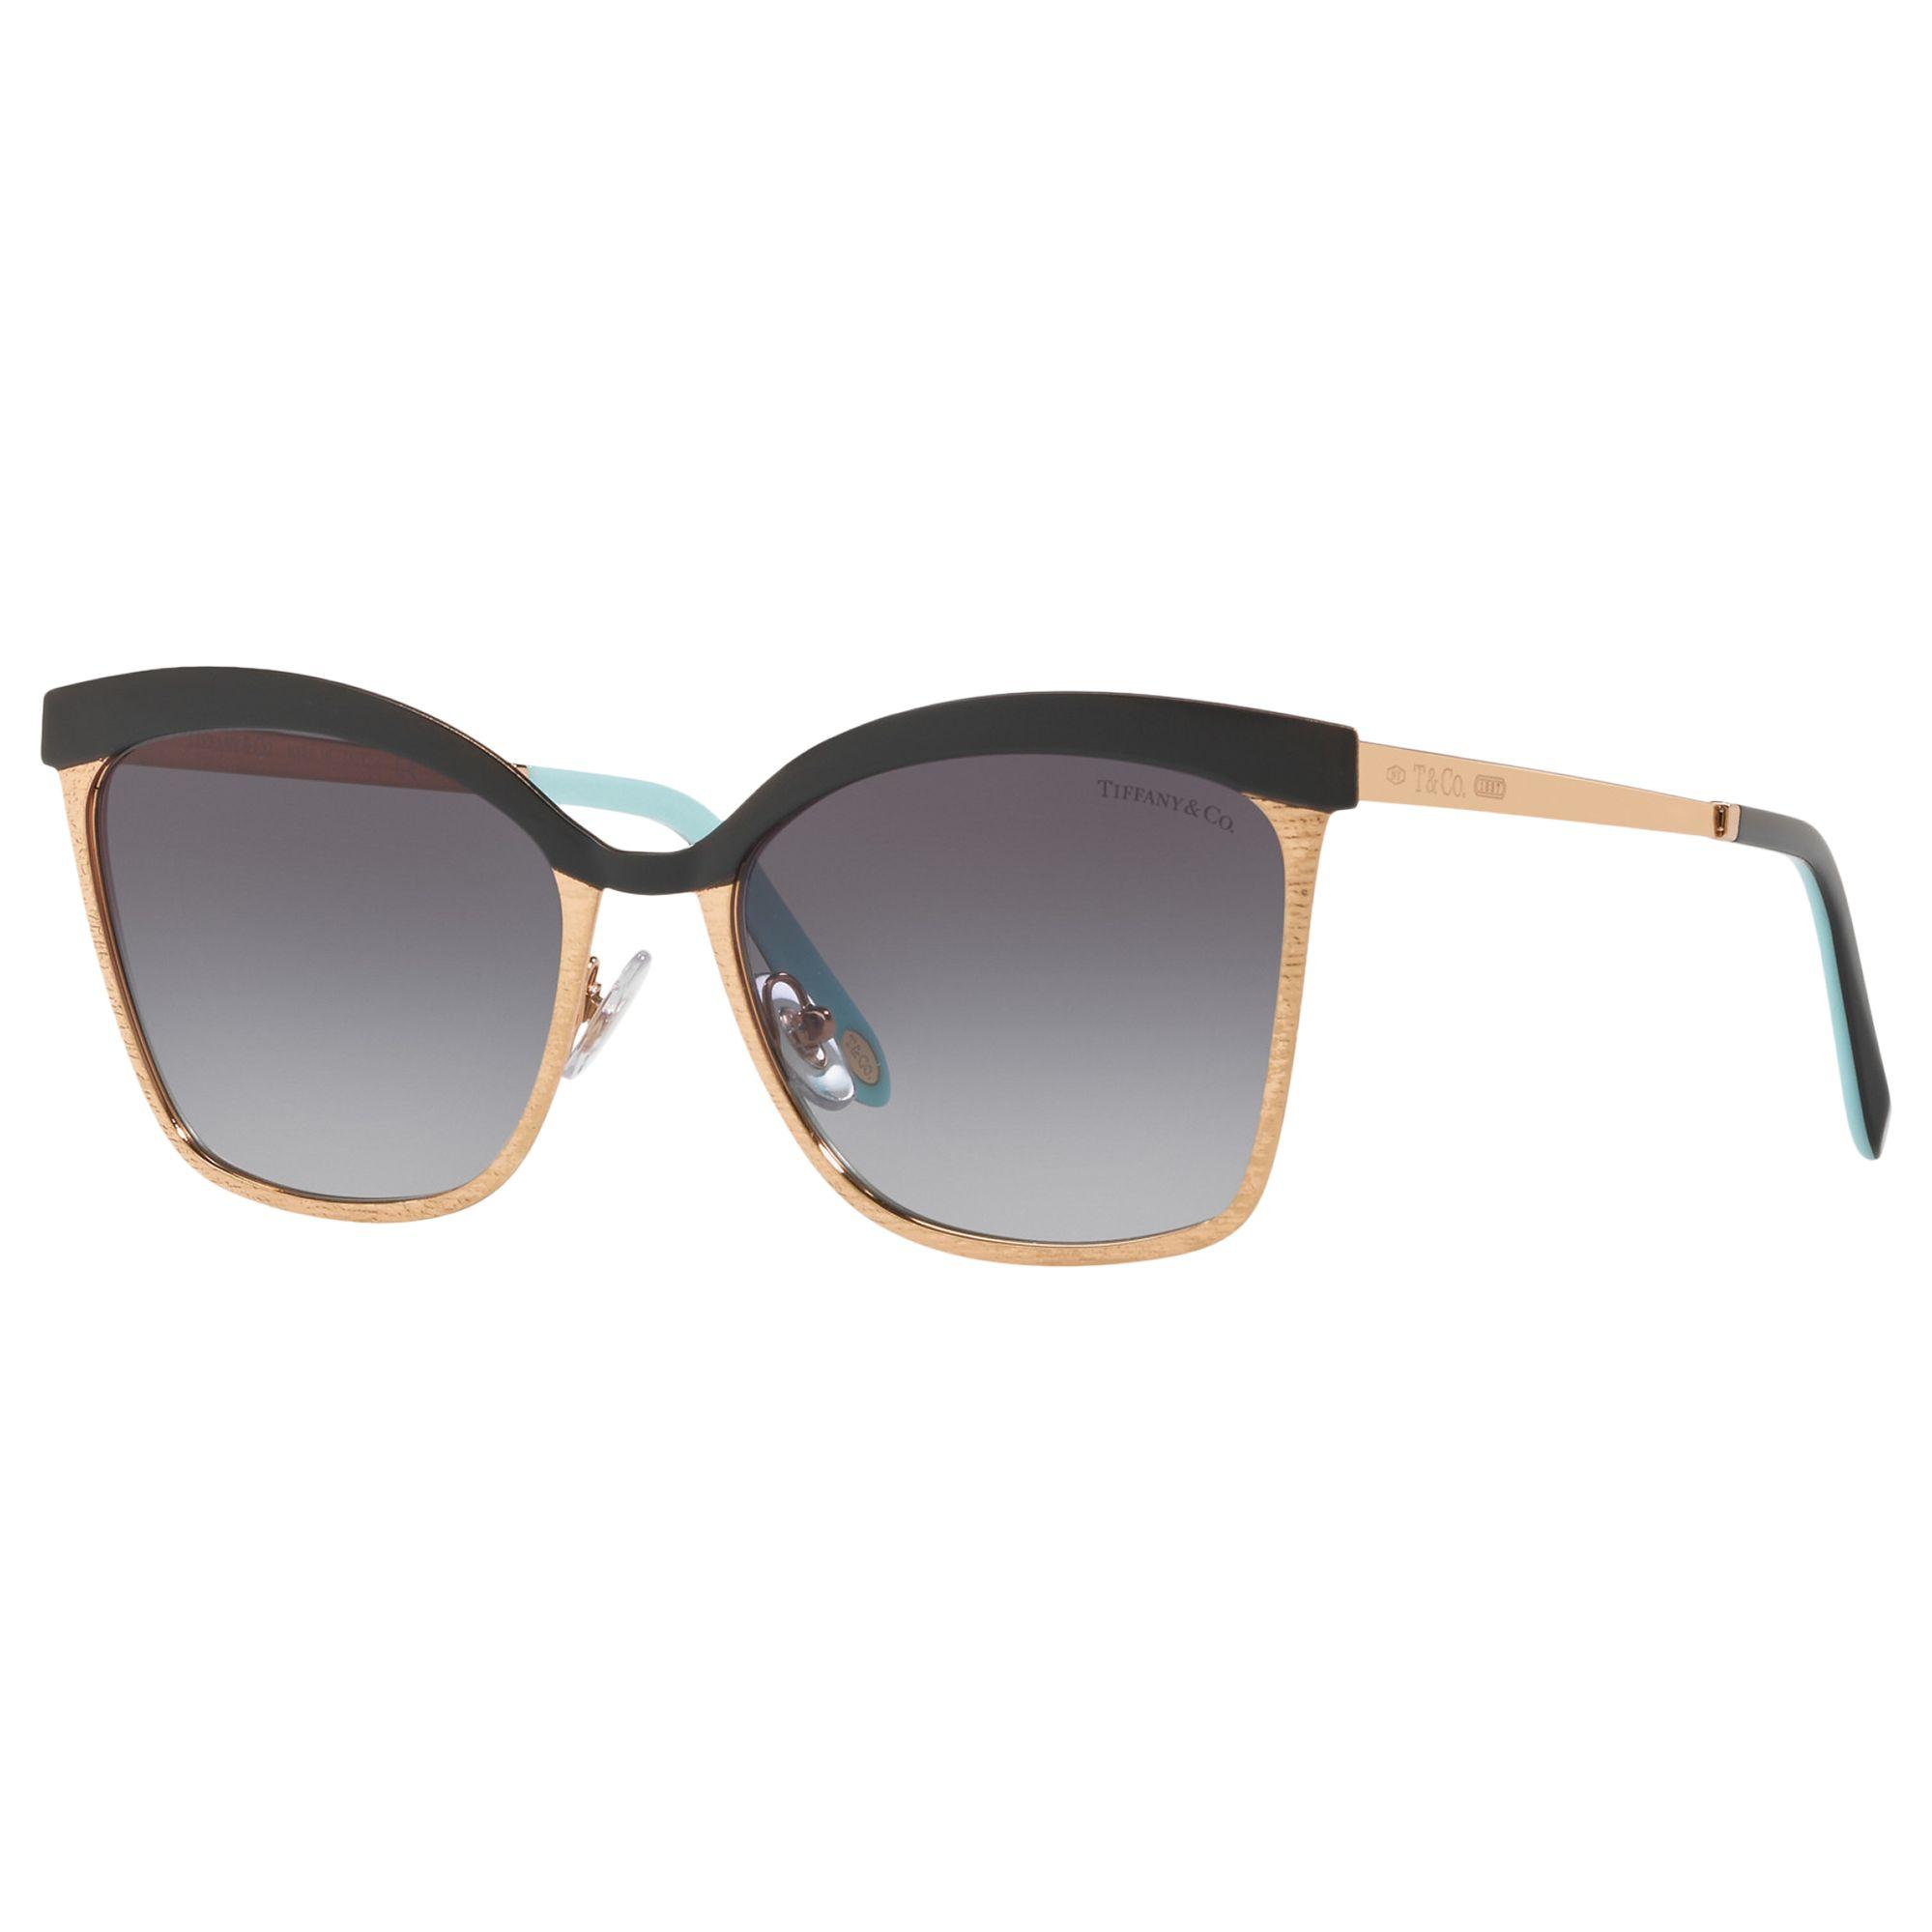 Tiffany & Co Tiffany & Co TF3060 Women's Square Sunglasses, Gold/Grey Gradient